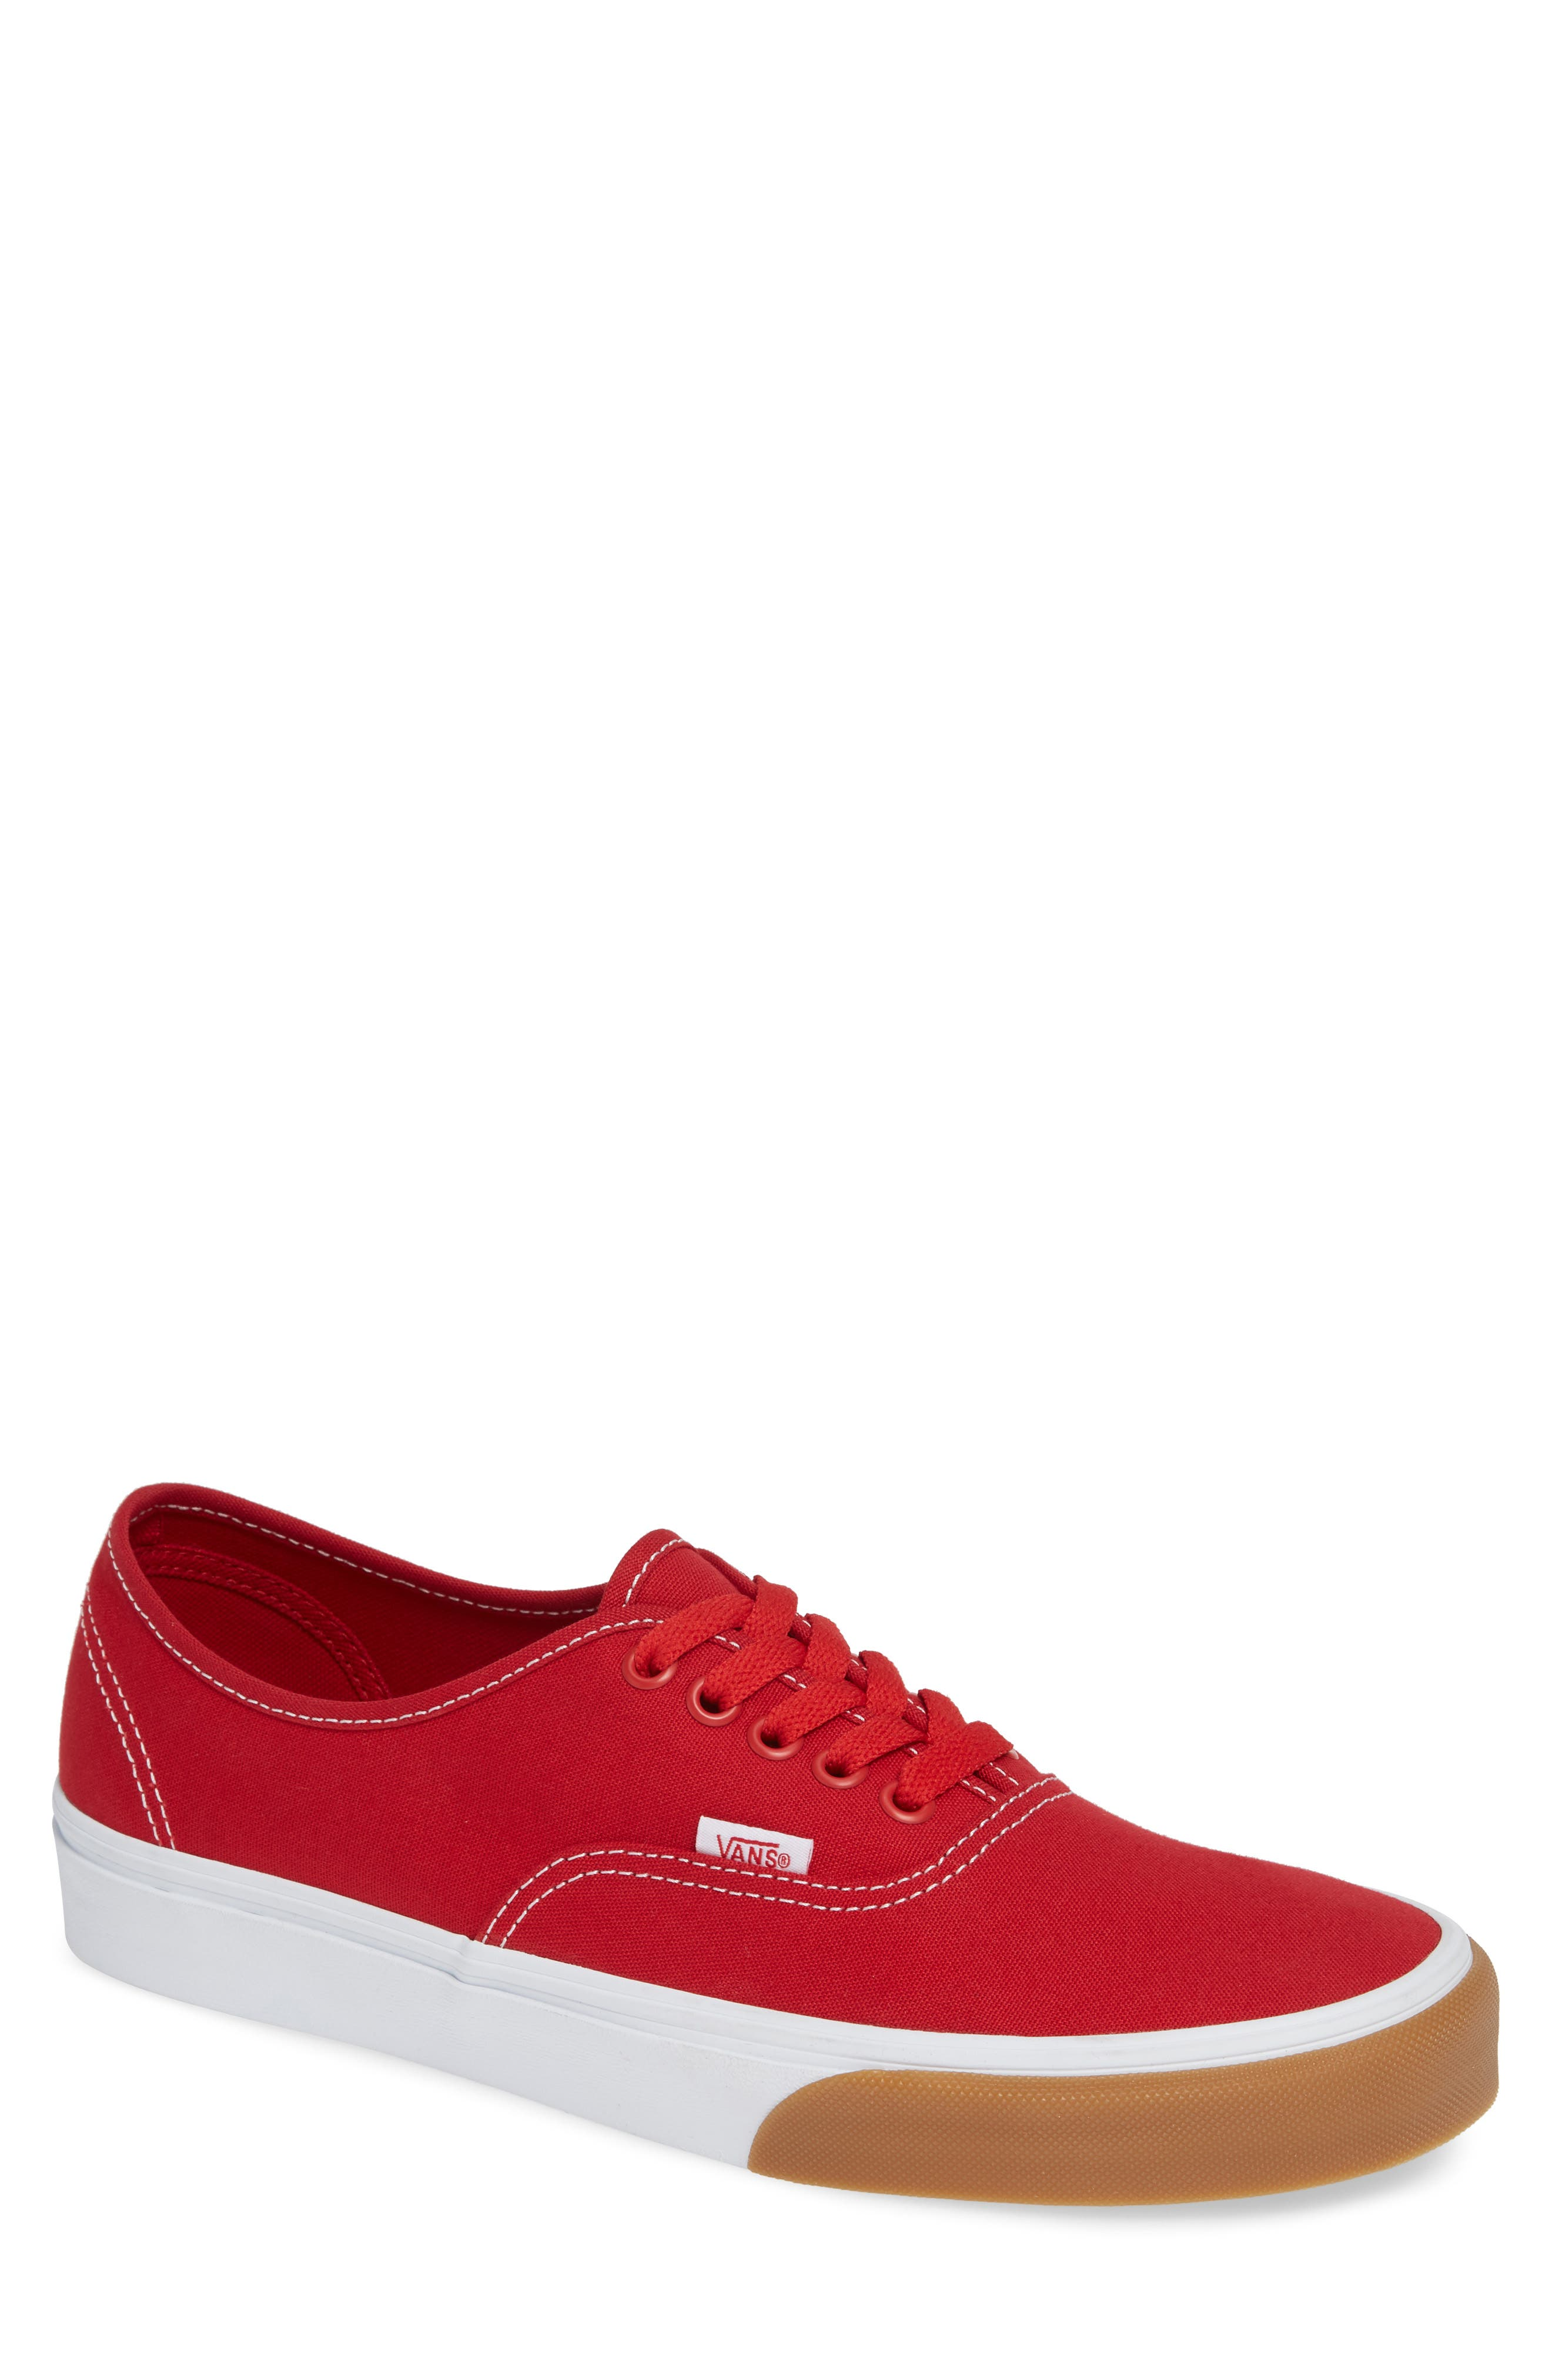 Authentic Gum Bumper Sneaker,                             Main thumbnail 1, color,                             Red/ True White